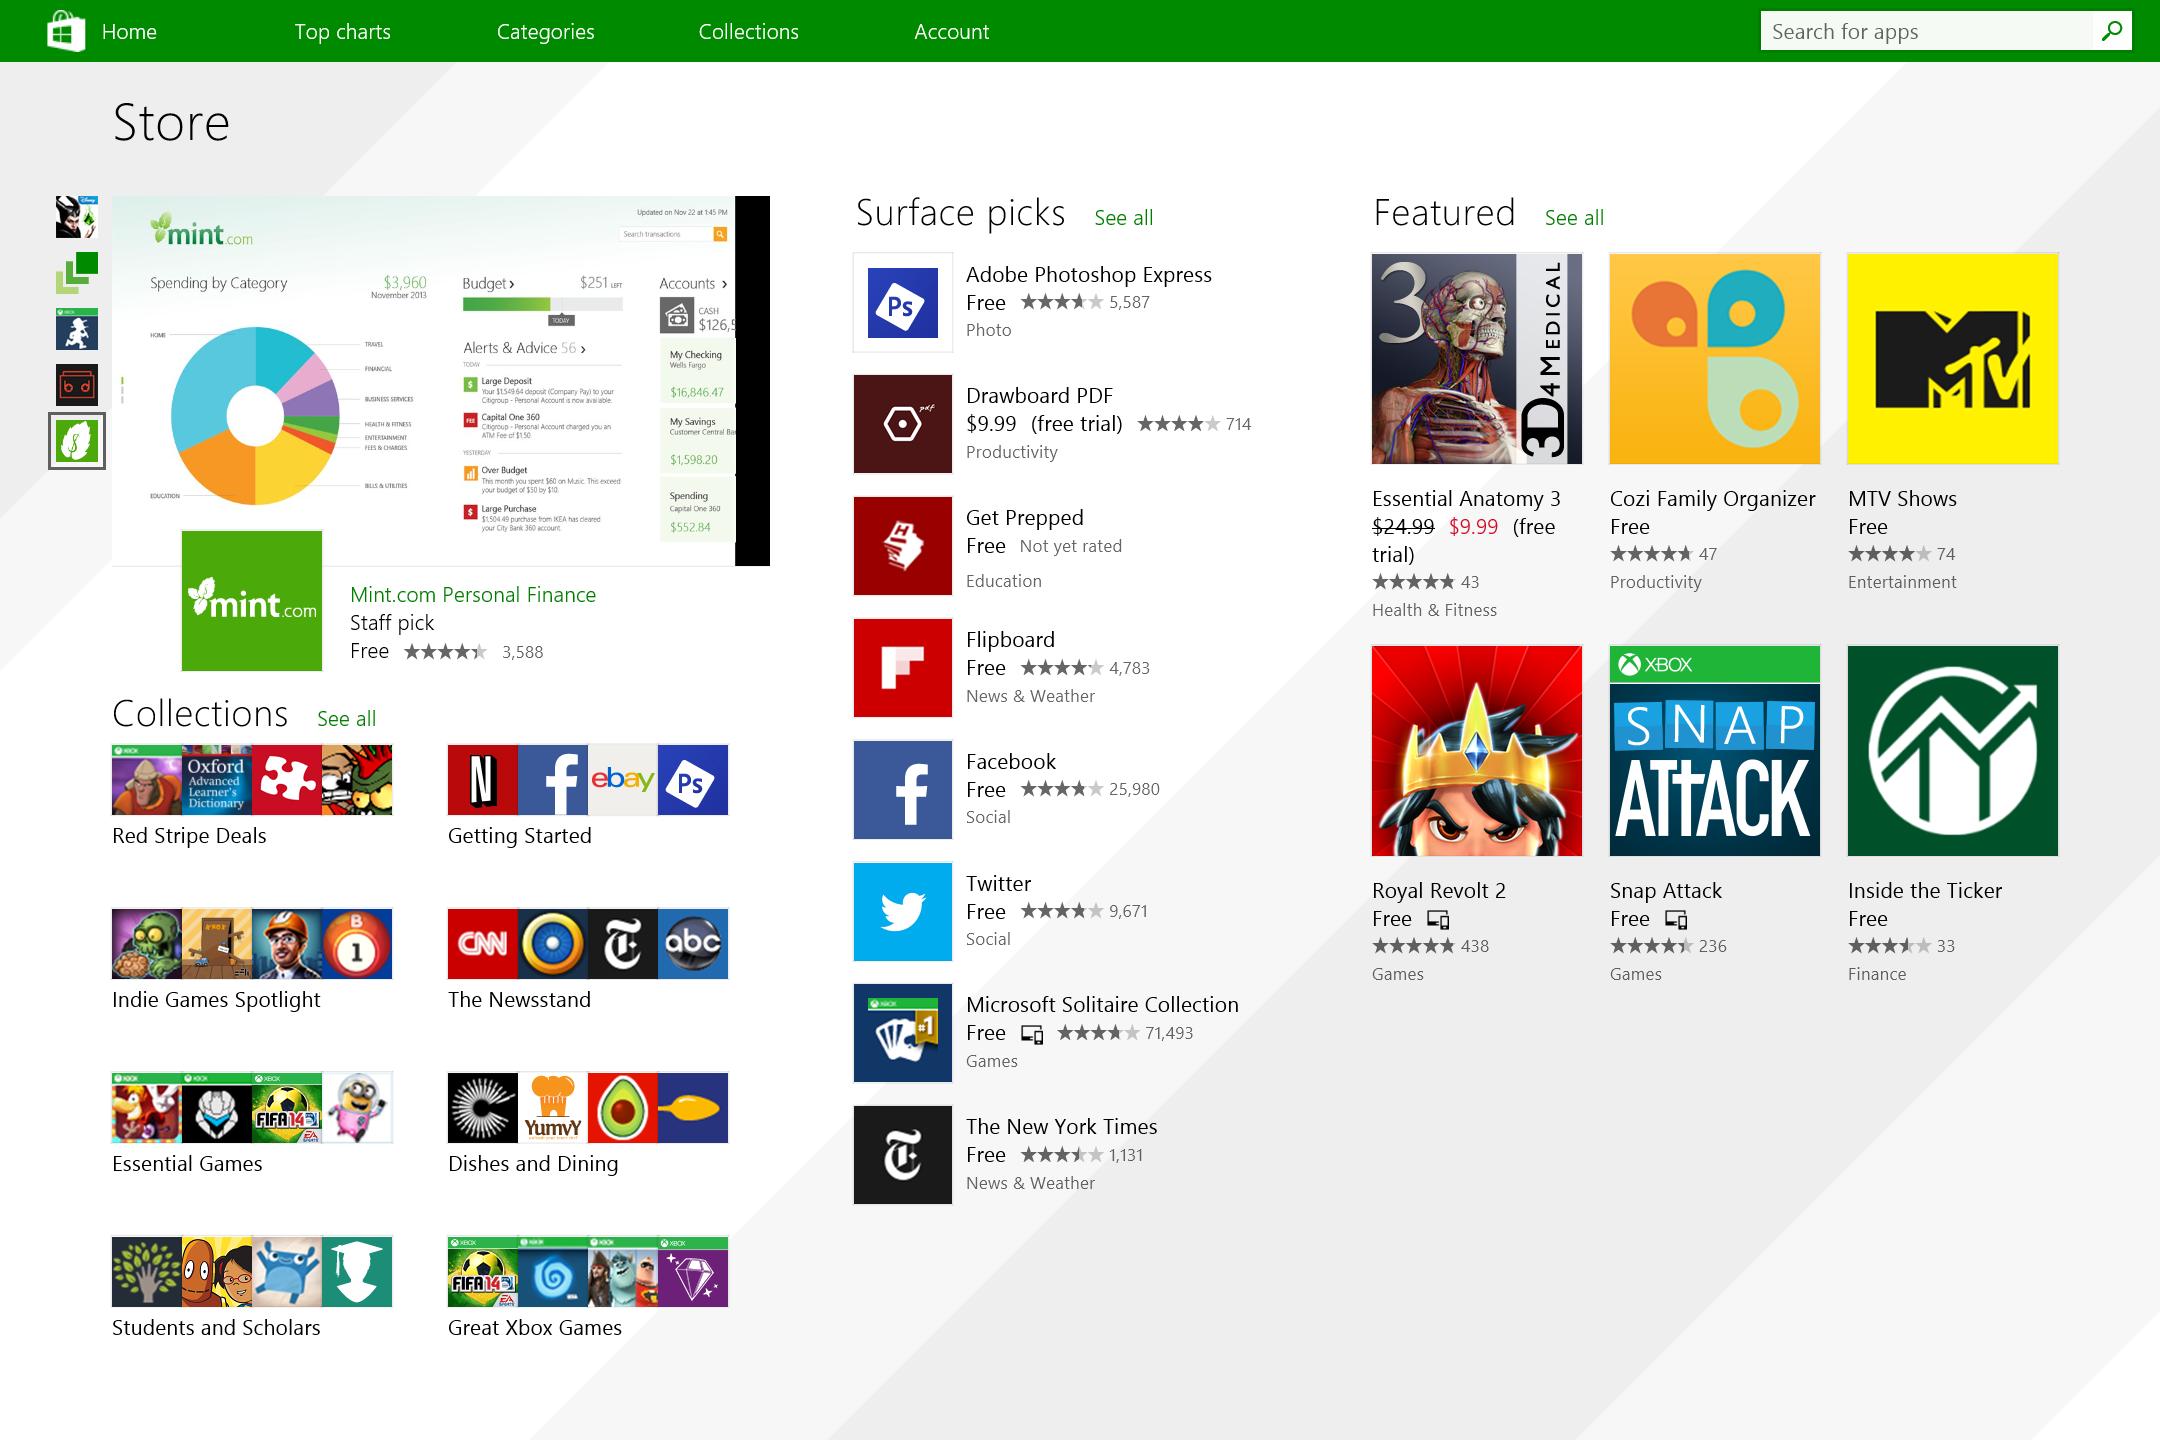 A screenshot of the Microsoft Surface 3's bundled software.